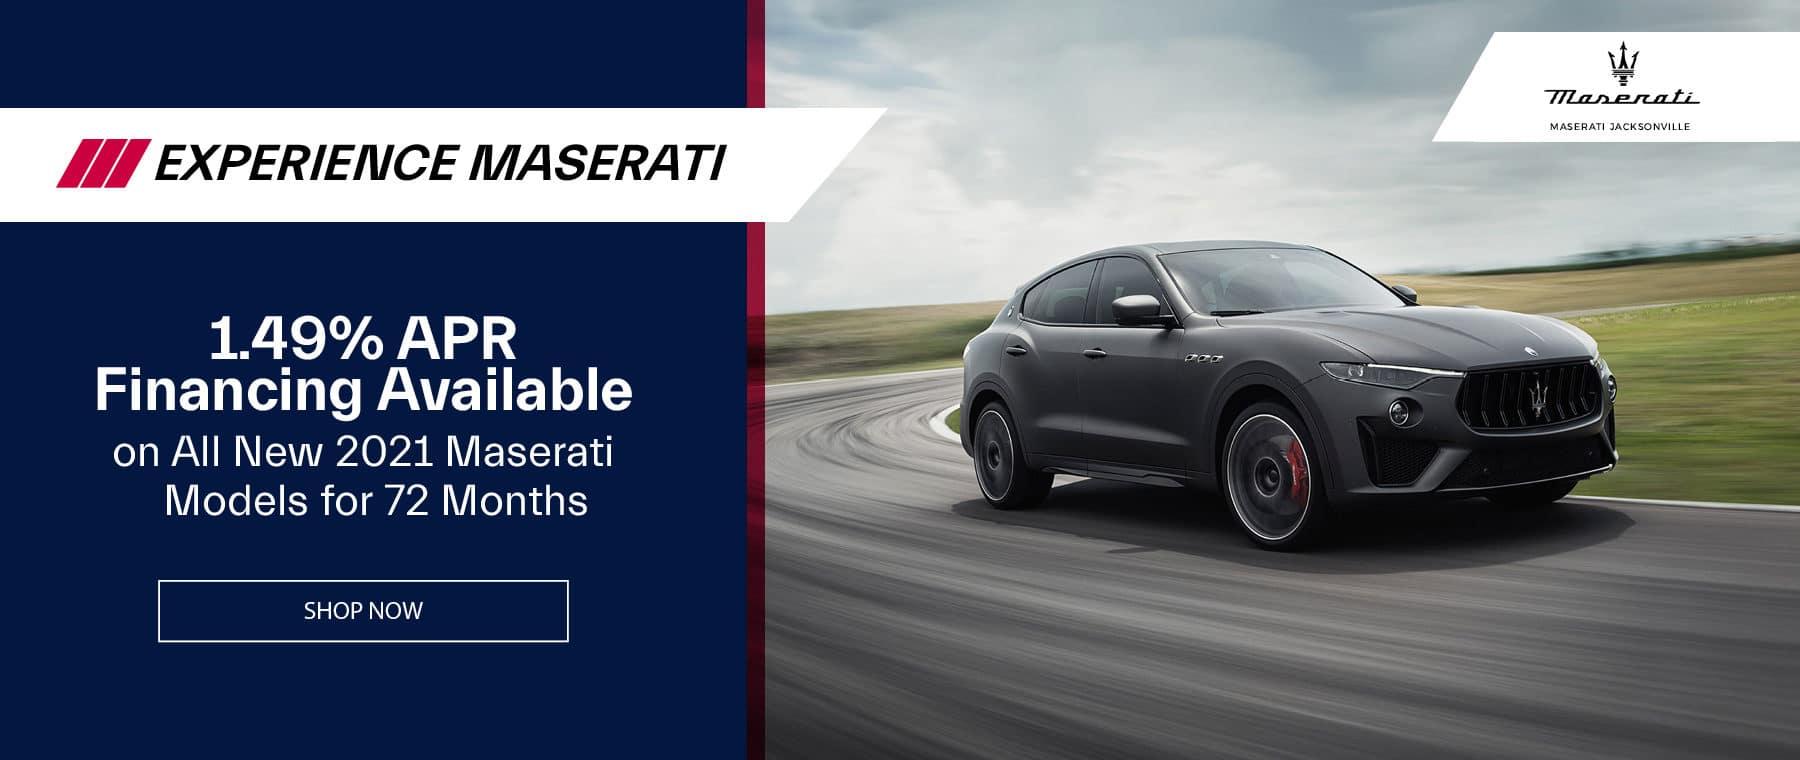 dark 2021 Maserati driving around a curvy road